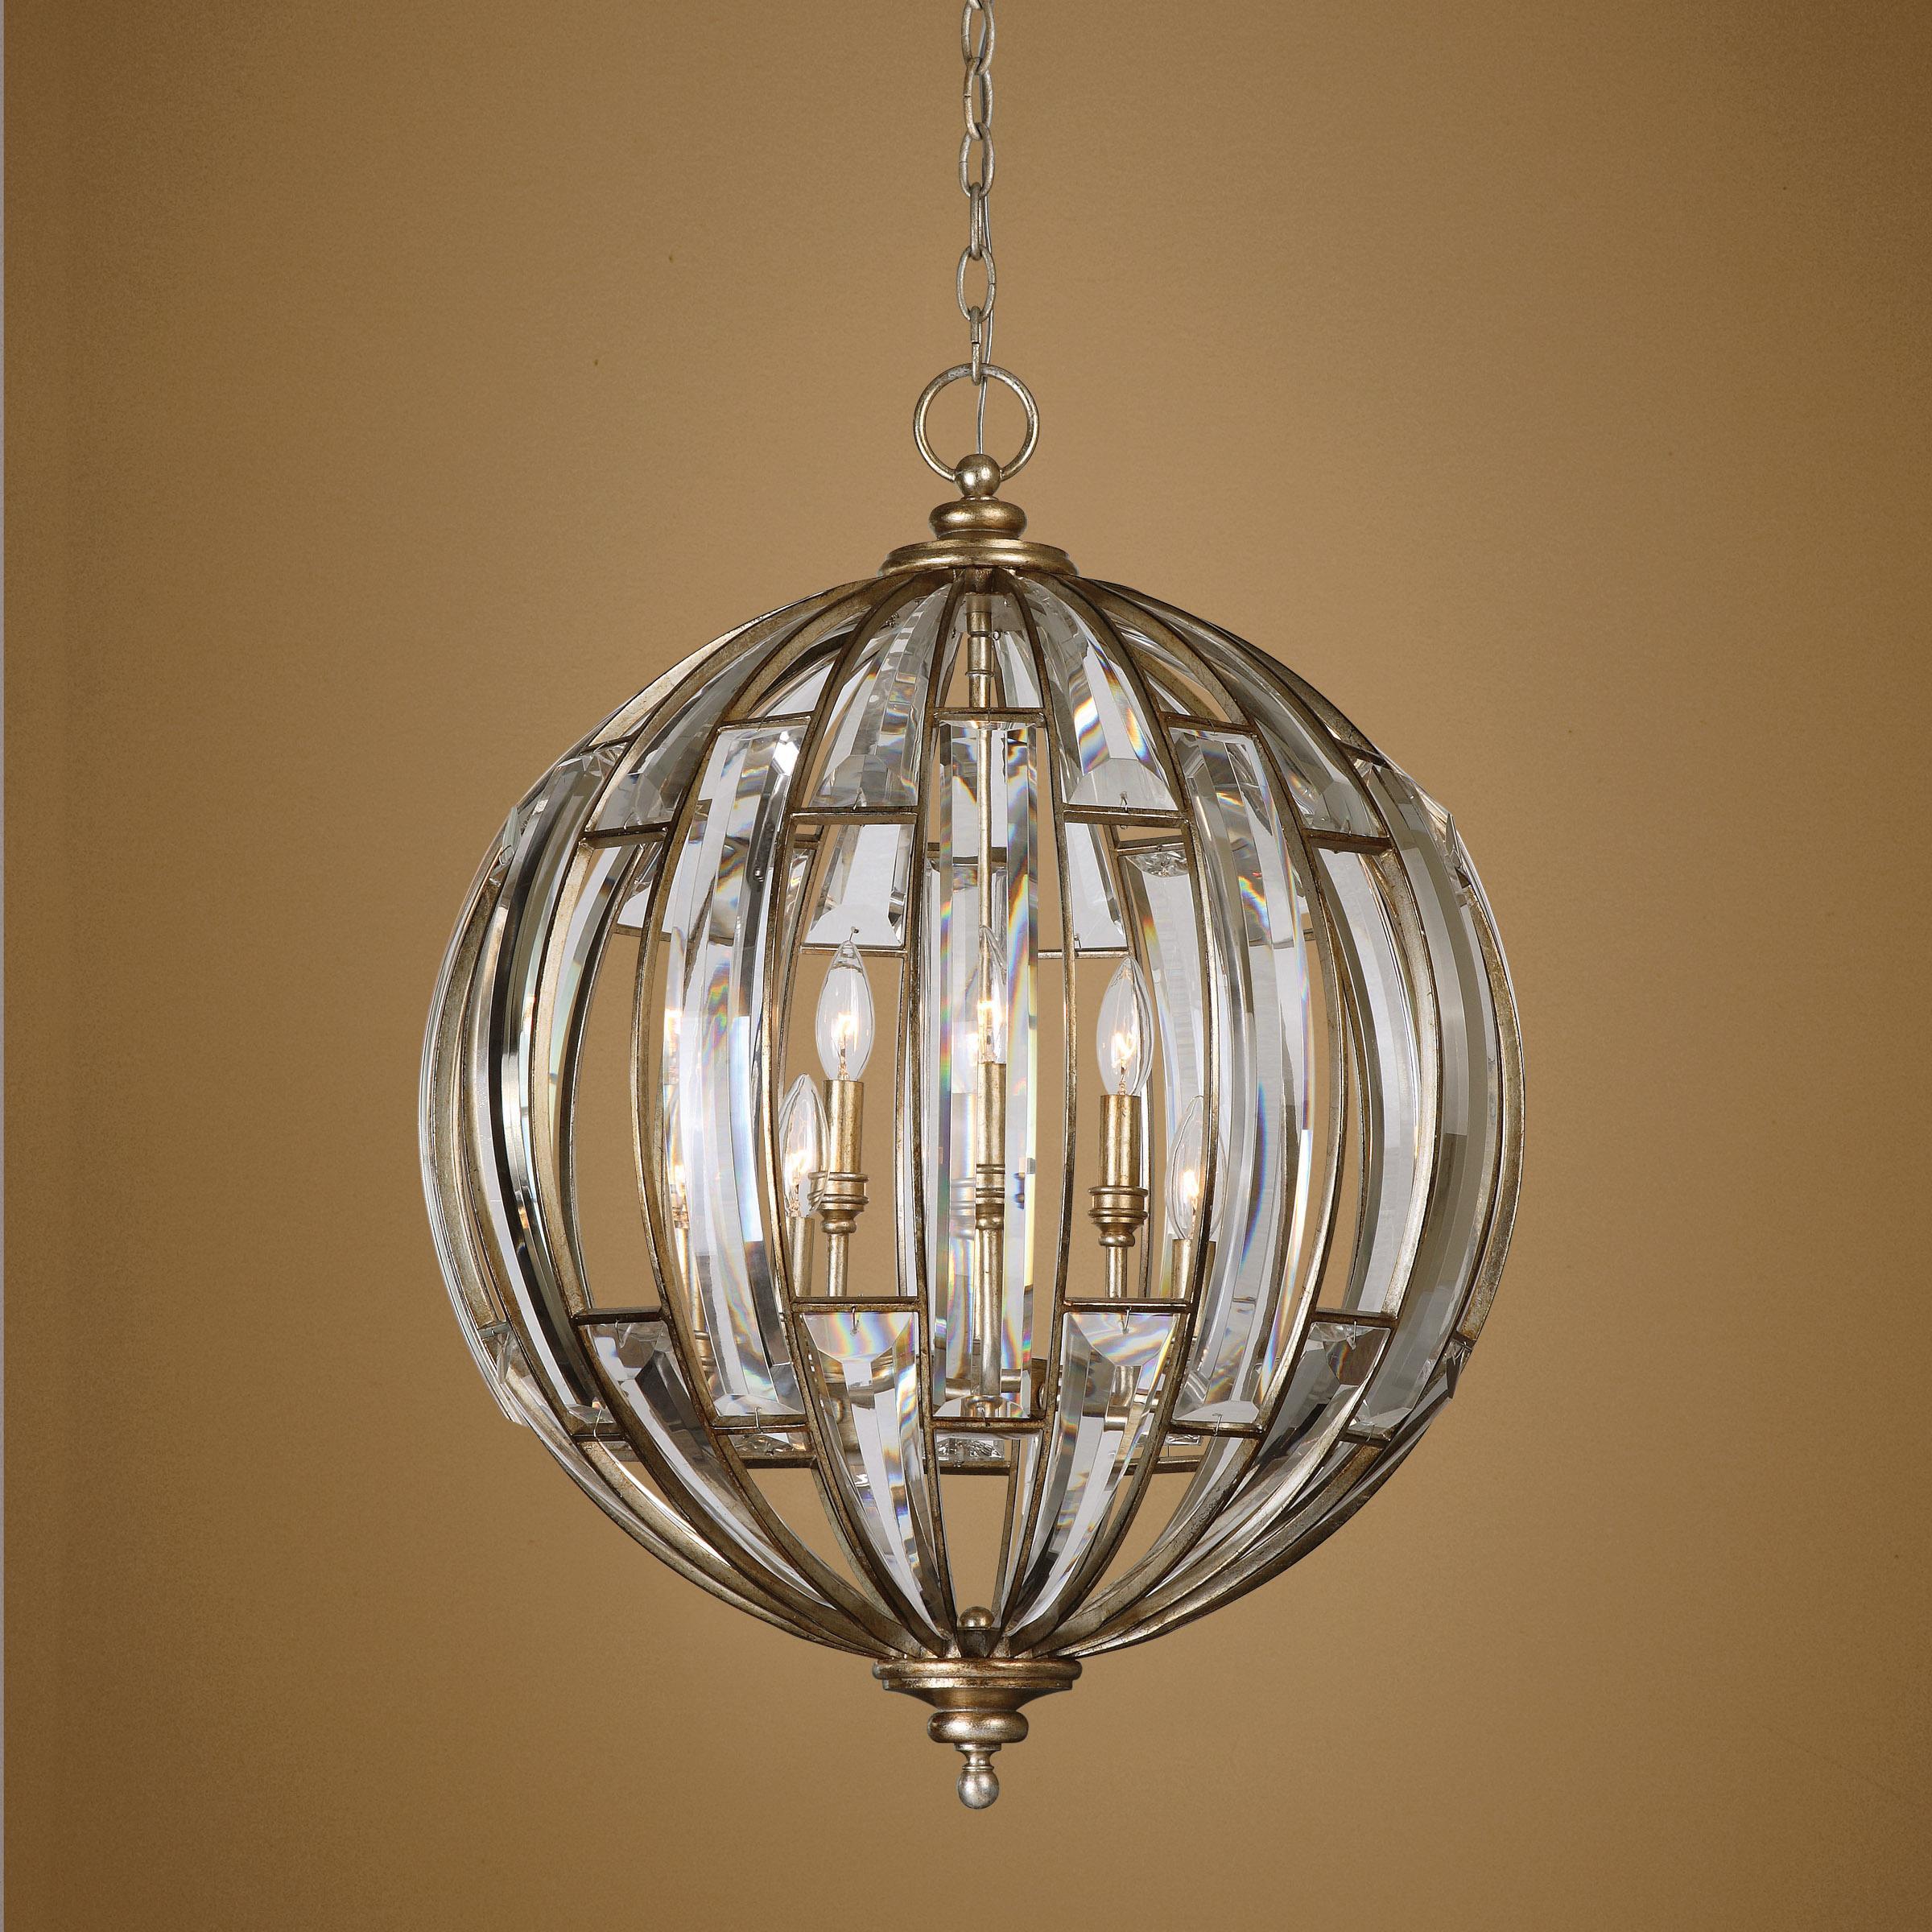 Uttermost Lighting Fixtures Pendant Lights Uttermost Vicentina 6 Light Sphere Pendant Wayside Furniture Pendant Lights Chandeliers